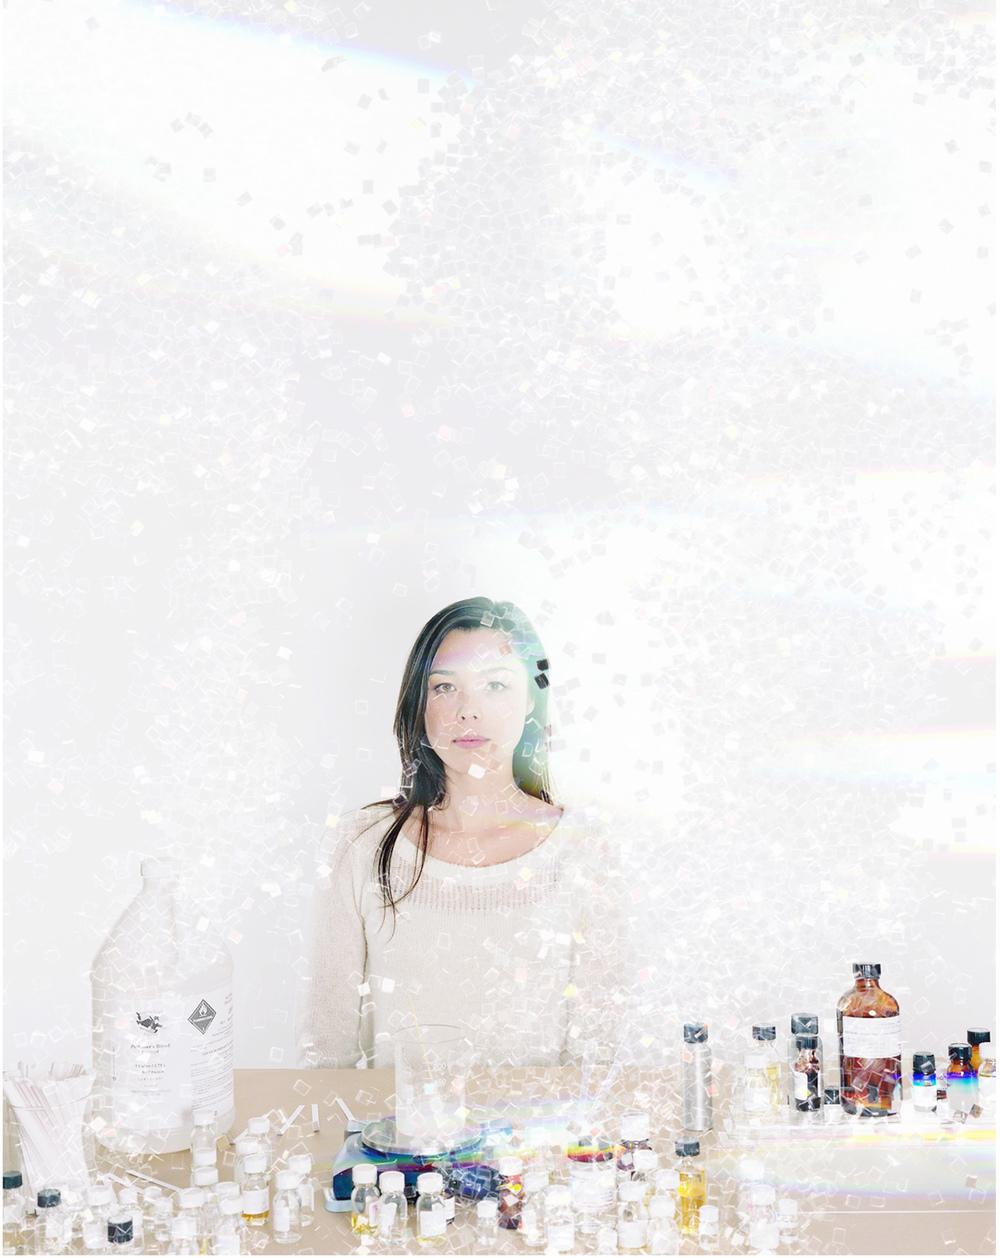 wallpaper_perfume_glitter_layover_lo_op.jpg